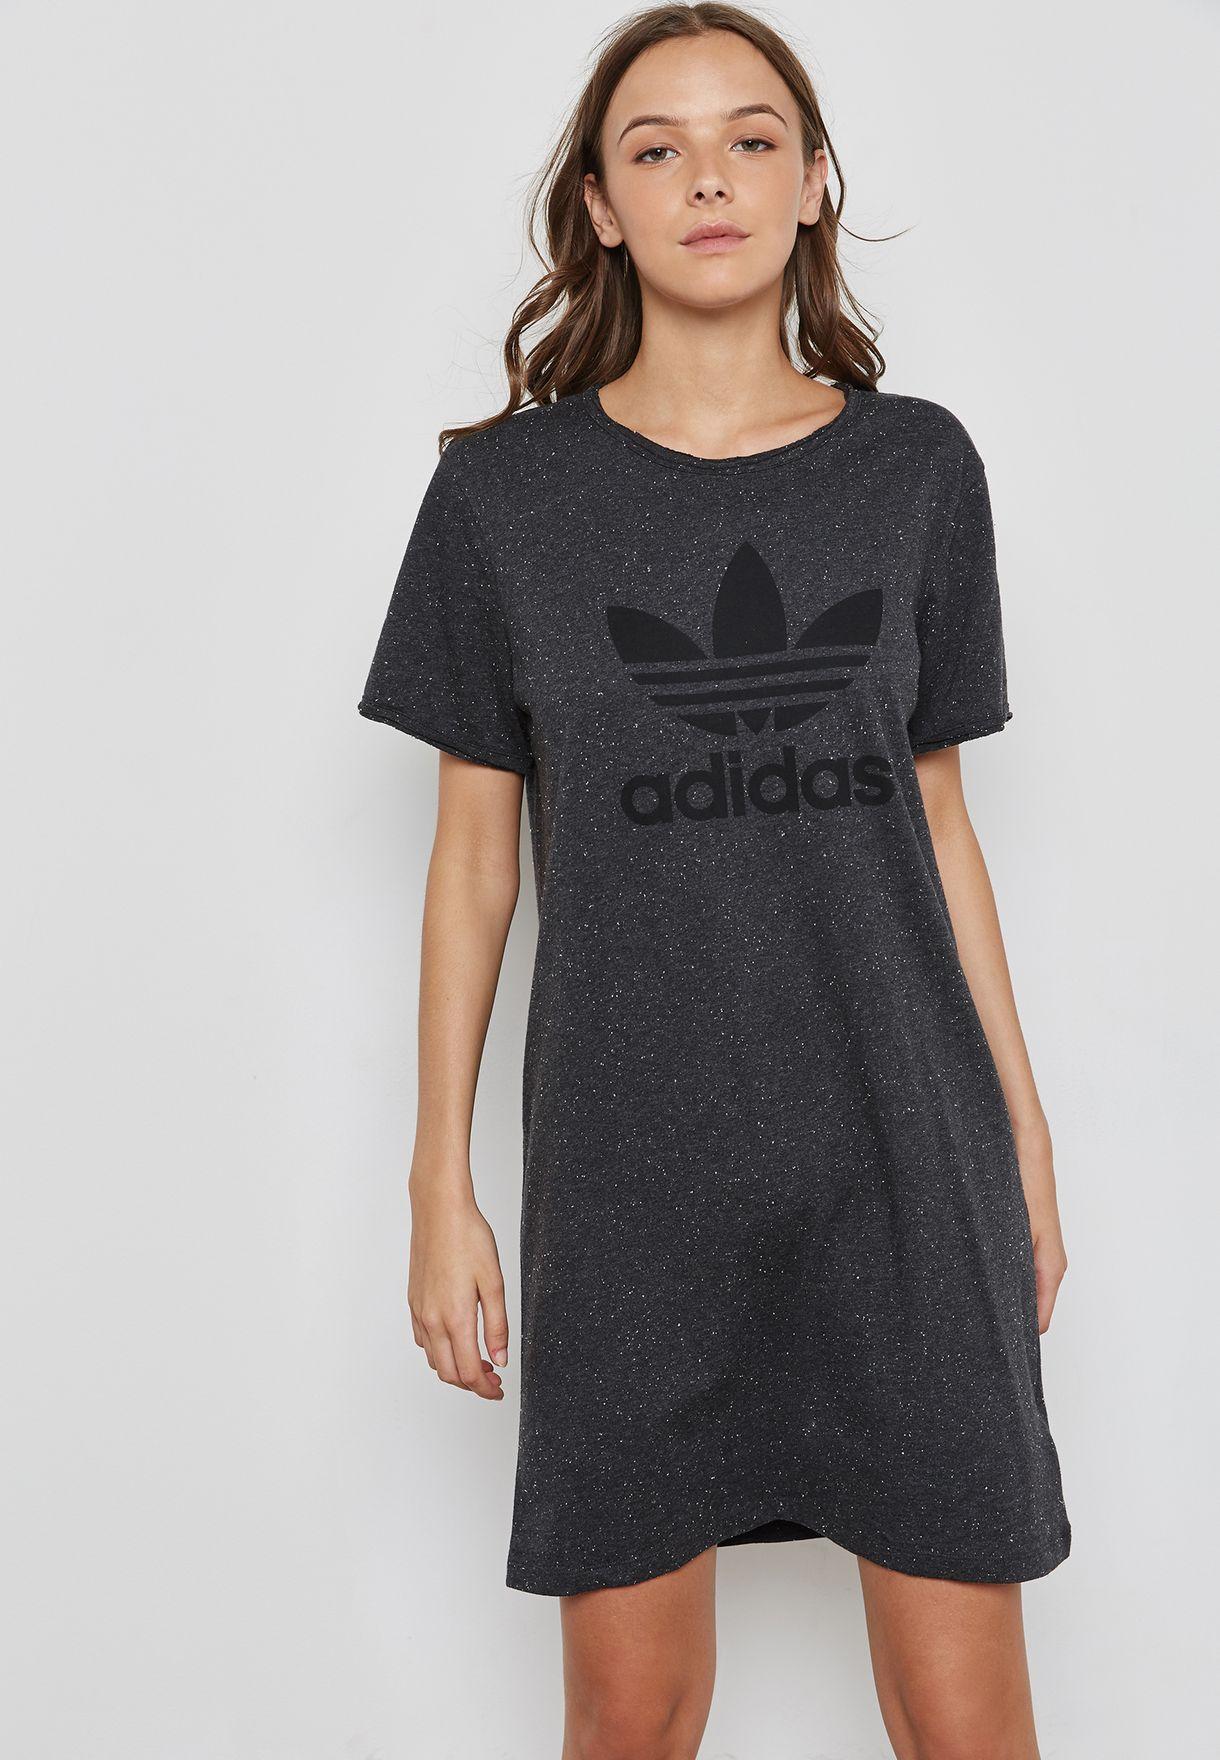 d31da481 Adidas Originals Trefoil T Shirt Dress - Nils Stucki Kieferorthopäde